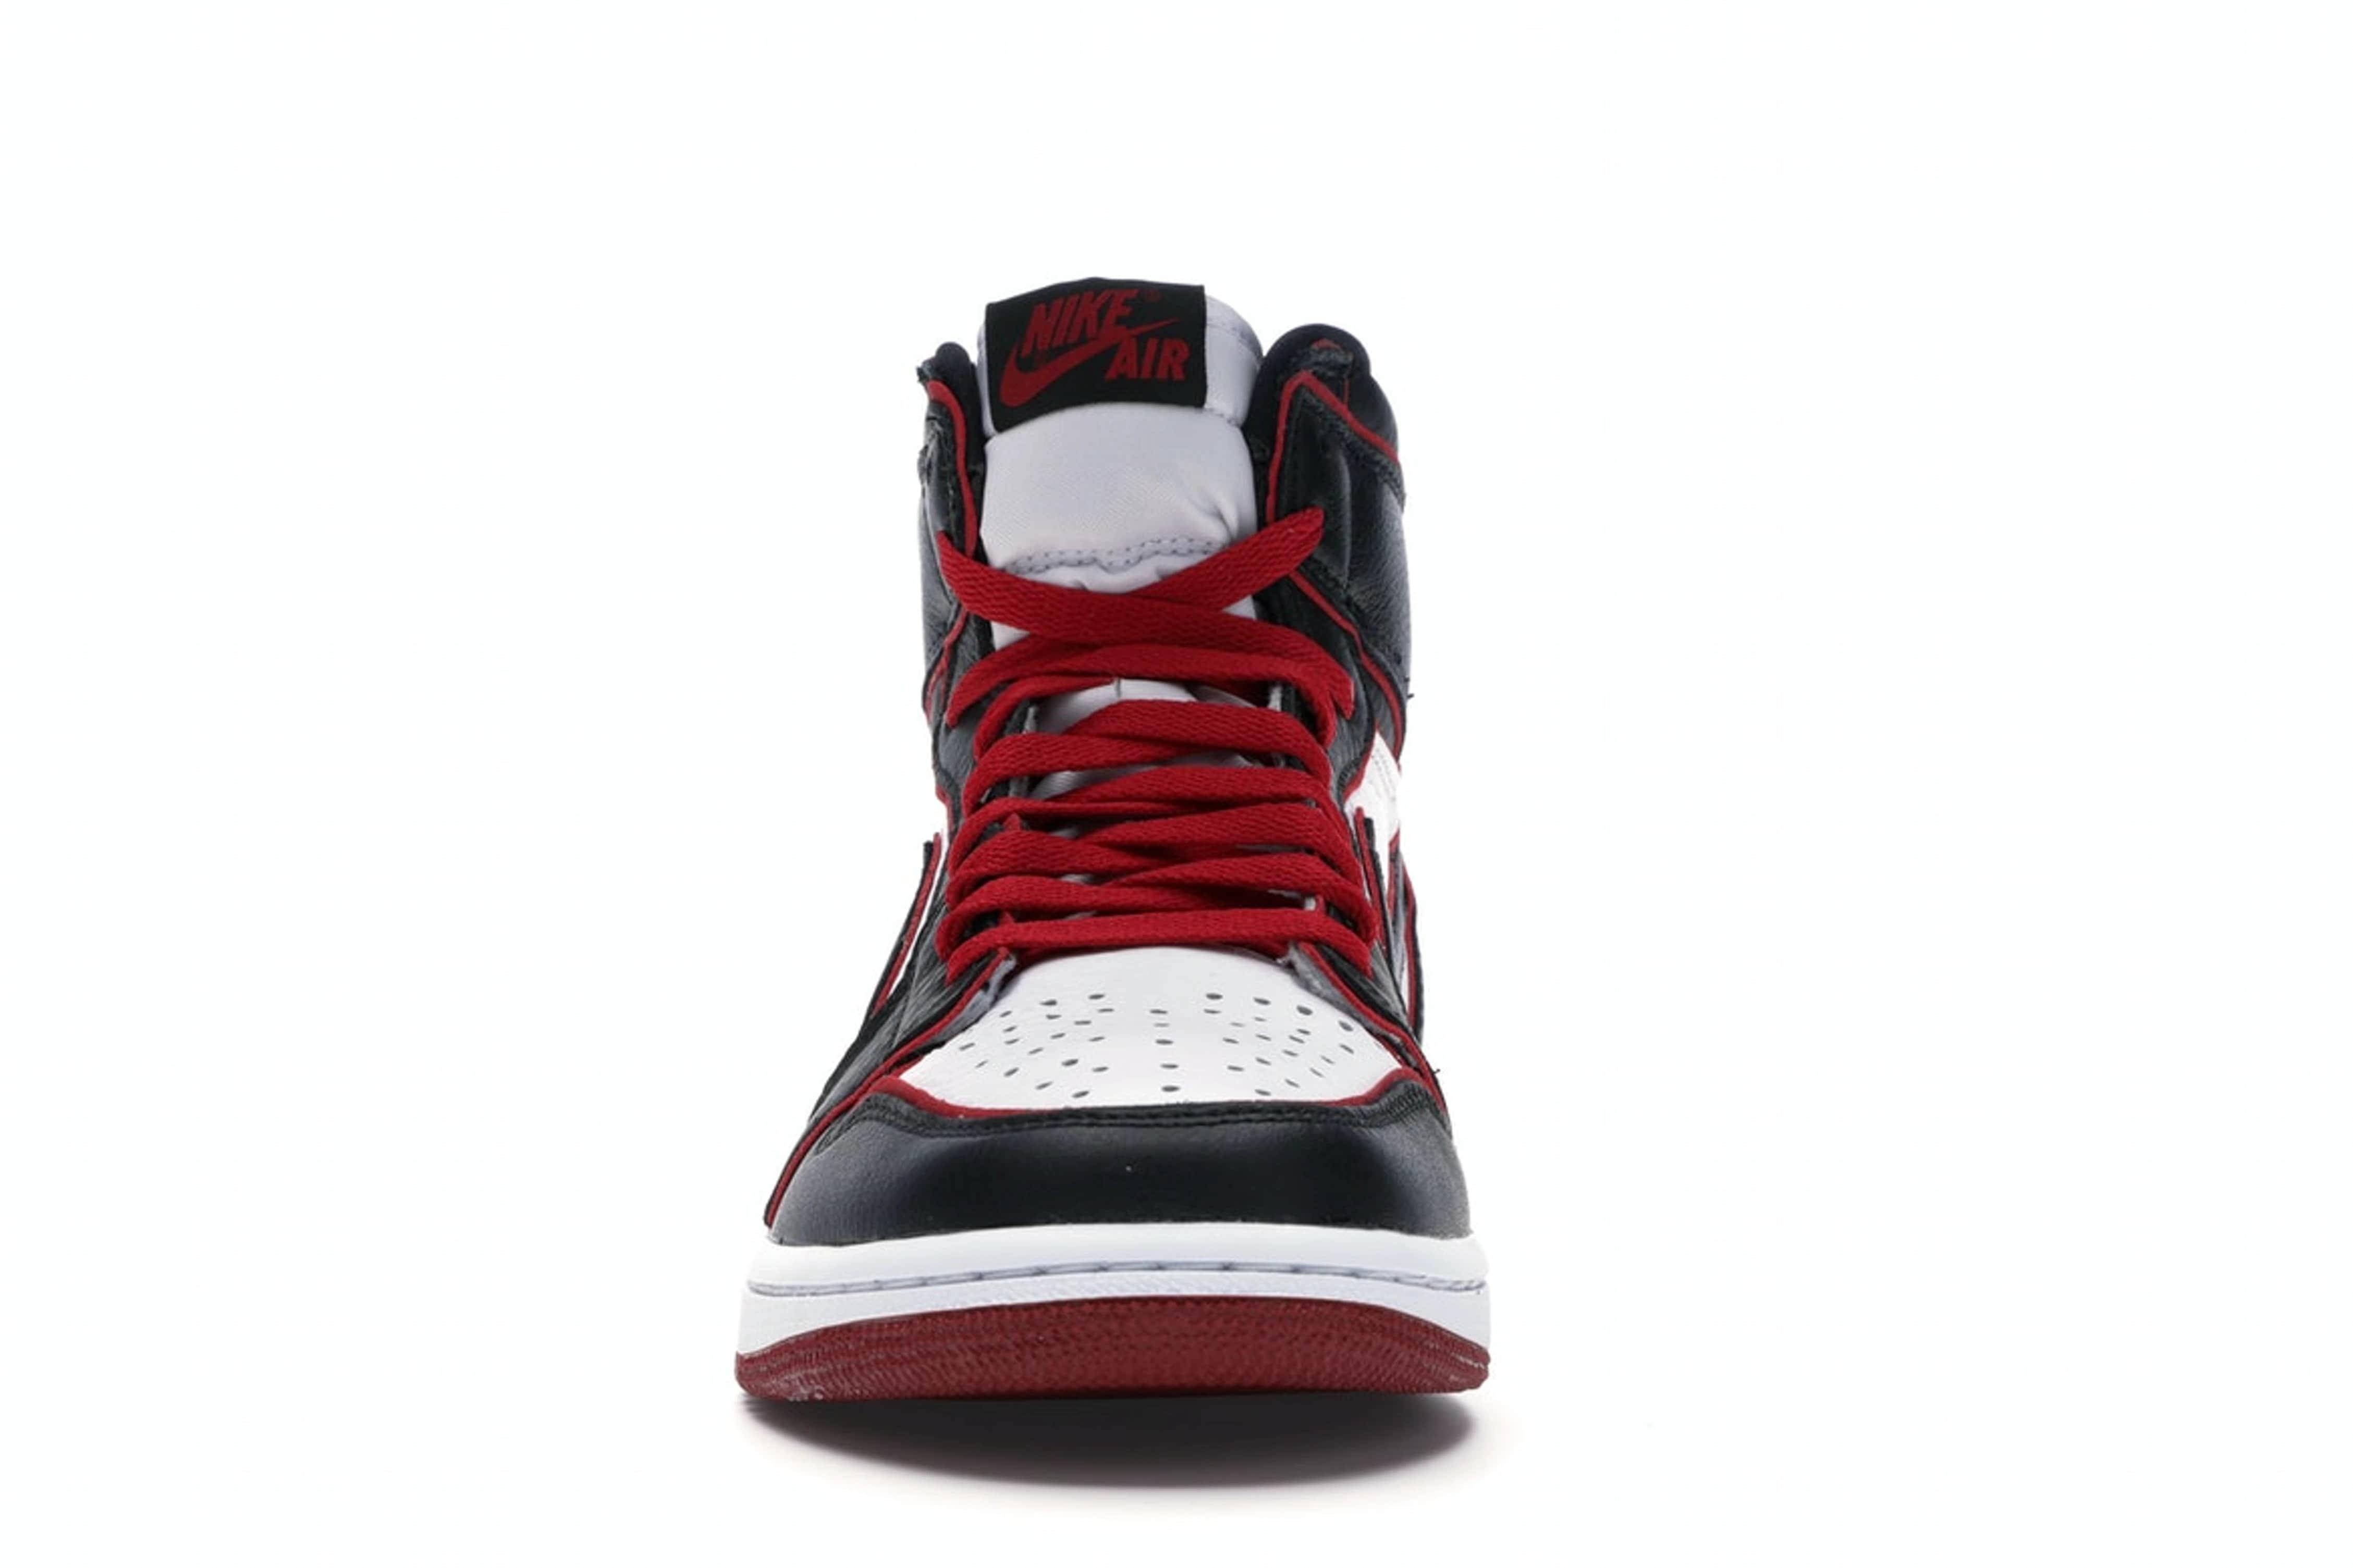 slide 2 - Jordan 1 Retro High Bloodline